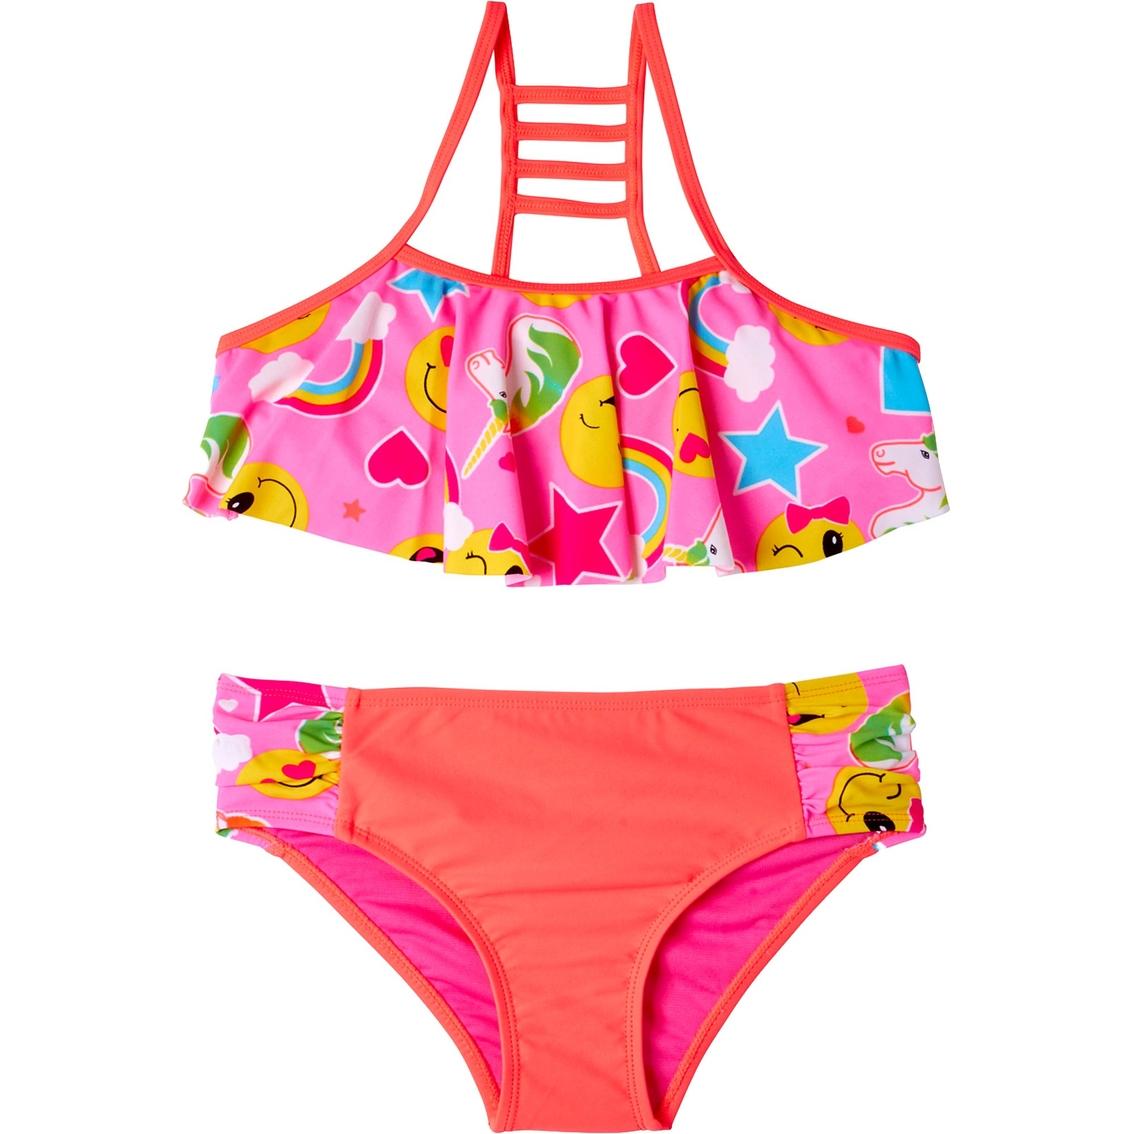 779aadd001 Limited Too Girls Emoji 2 Pc. Bikini Swimsuit